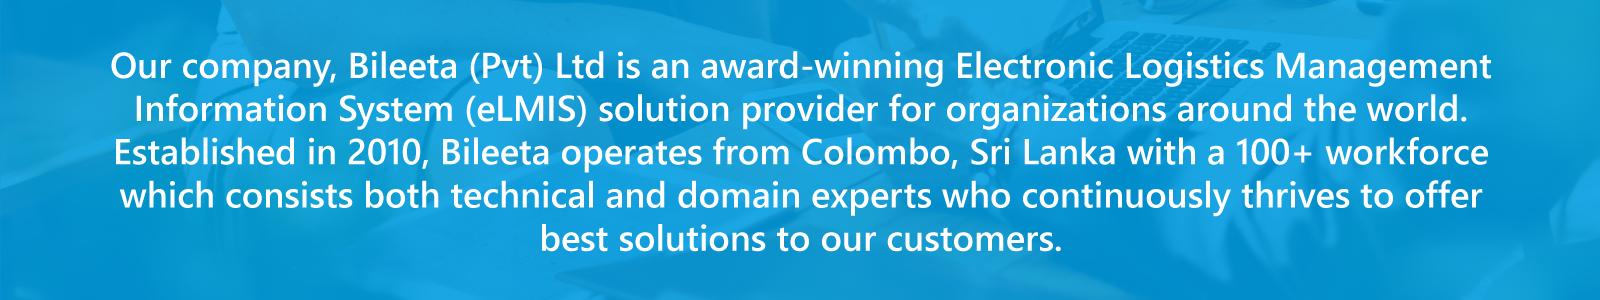 Award Winning Electronics Logistics Management Information System